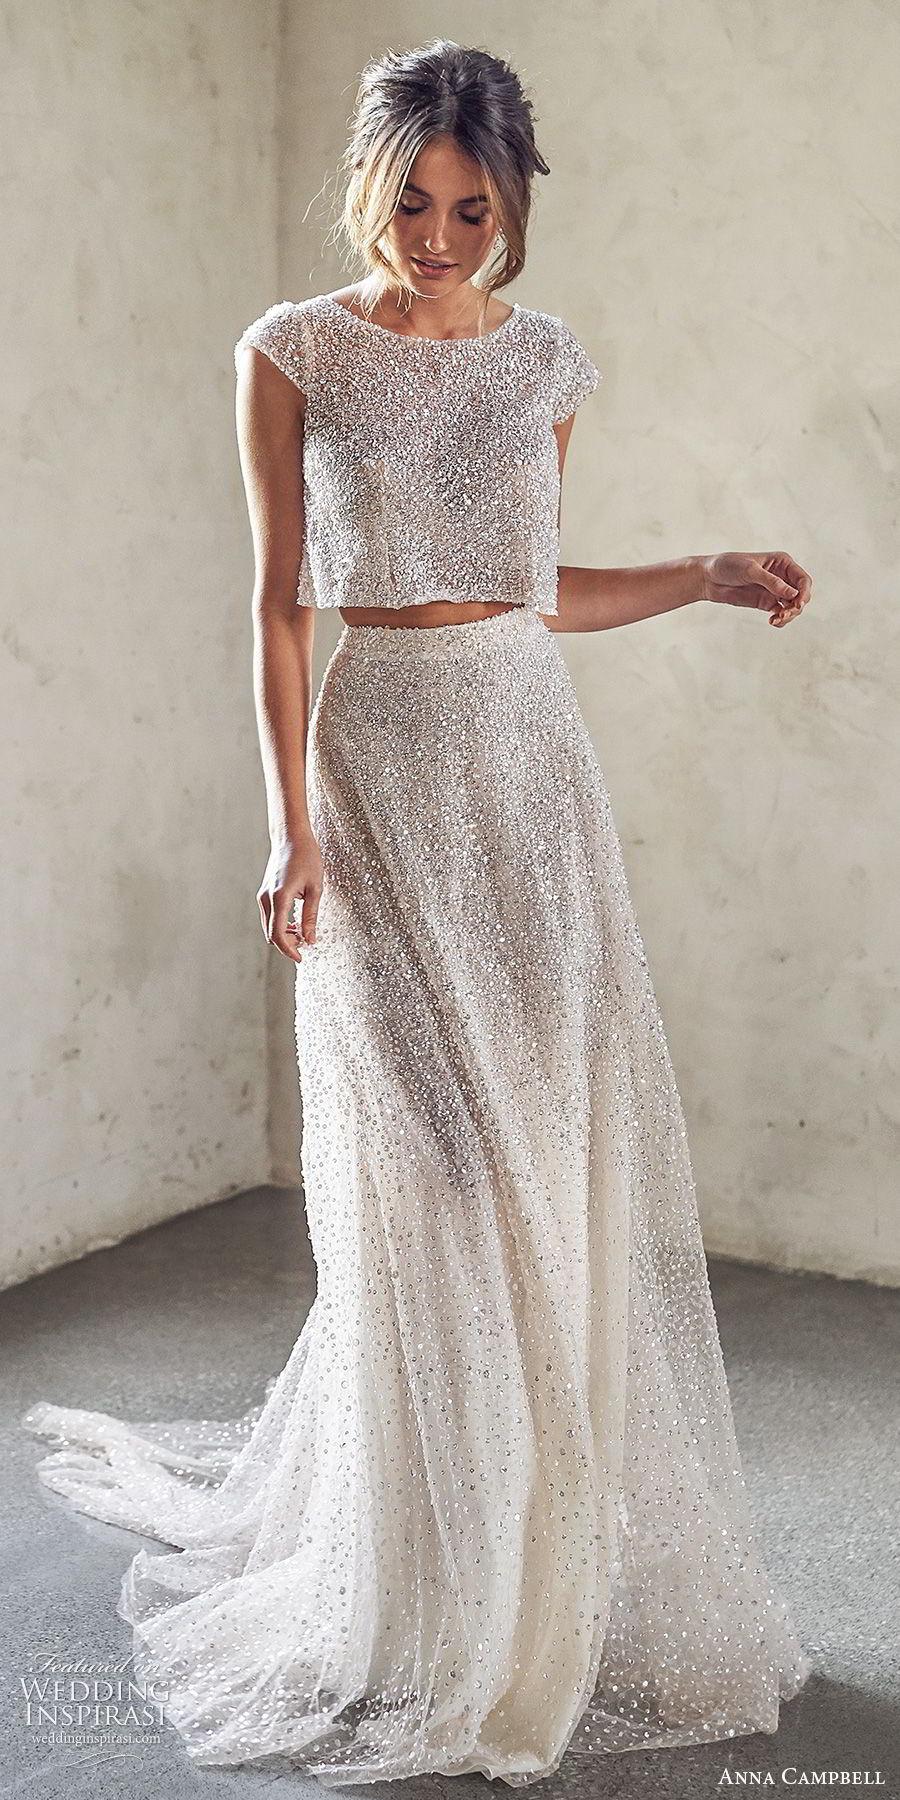 anna campbell 2020 bridal cap sleeves jewel neck fully embellished crop top a line skirt wedding dress (10) modern chapel train mv